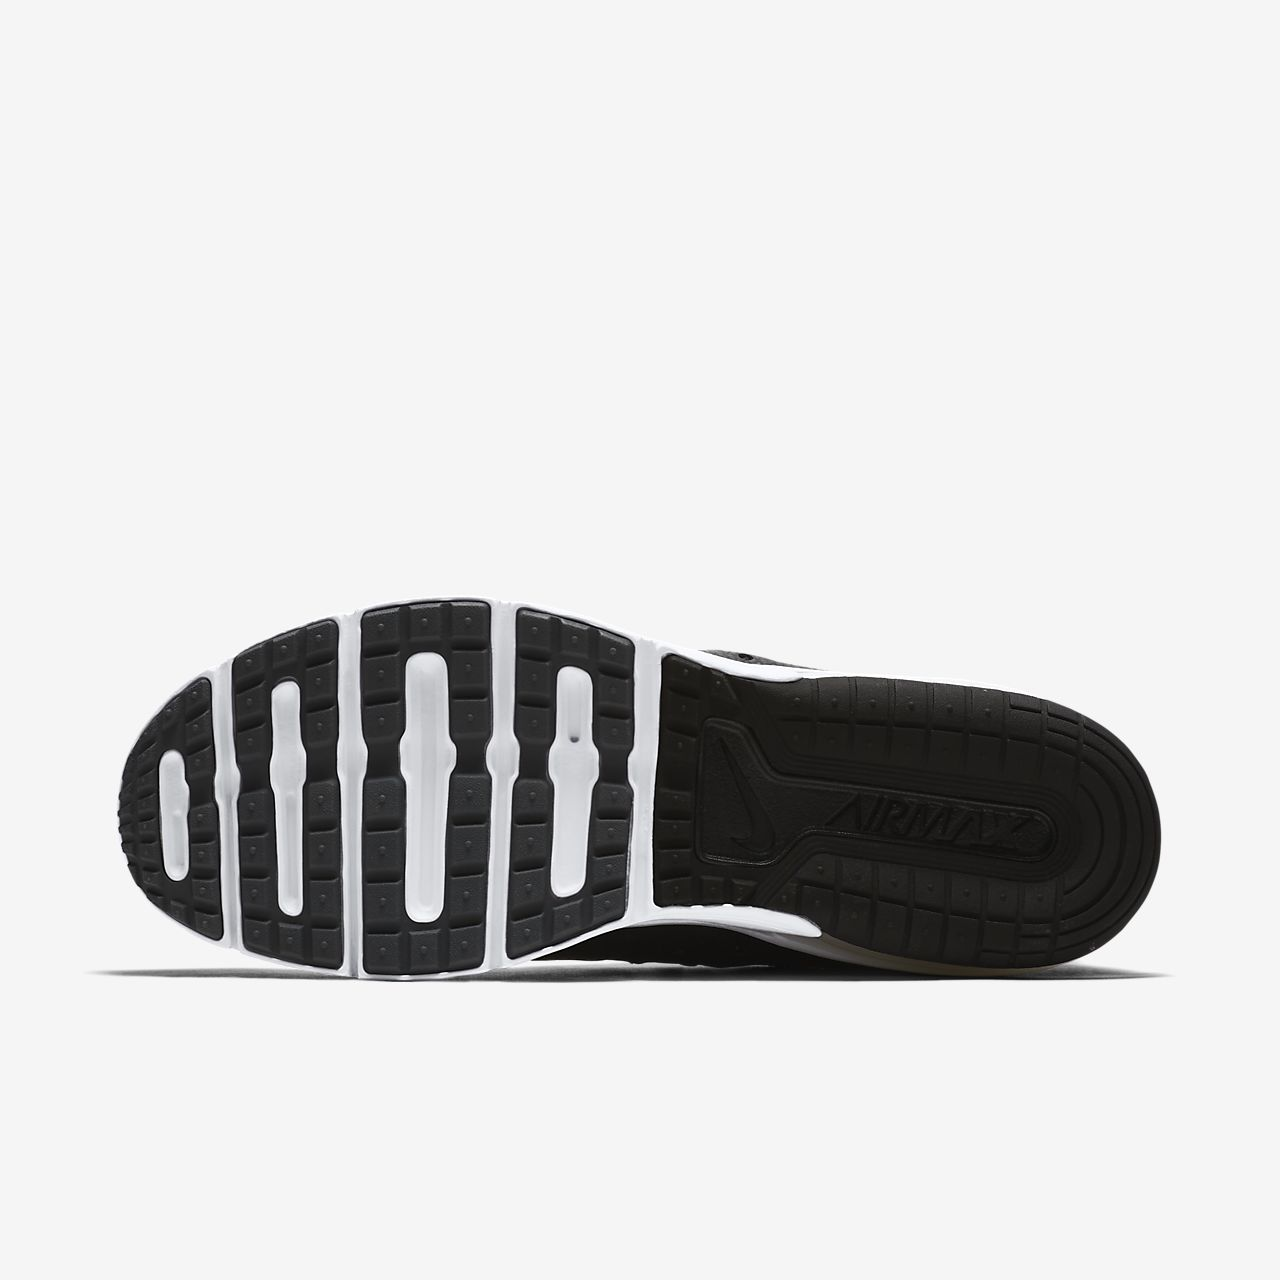 big sale ead30 960eb ... Chaussure Nike Air Max Sequent 3 pour Femme